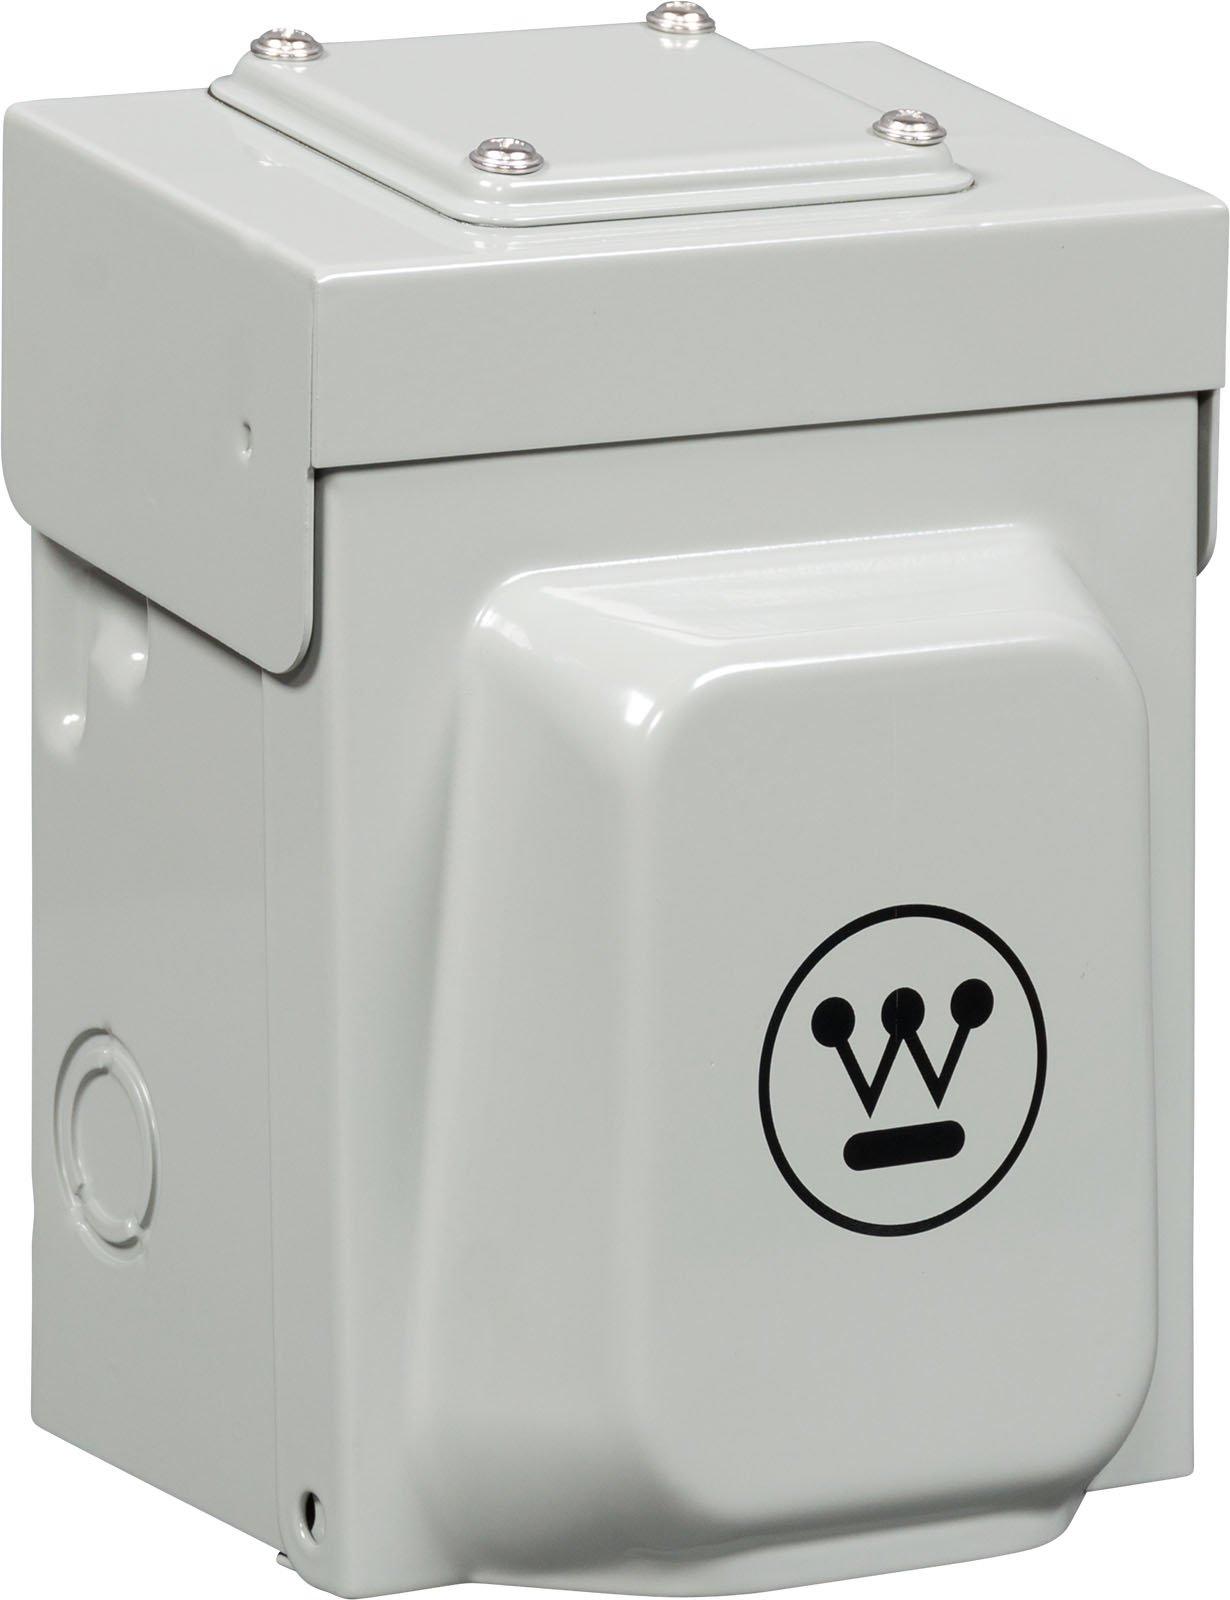 Westinghouse Heavy Duty 30 Amp (NEMA L14-30) Power Inlet Box for Portable Generator Transfer Switch